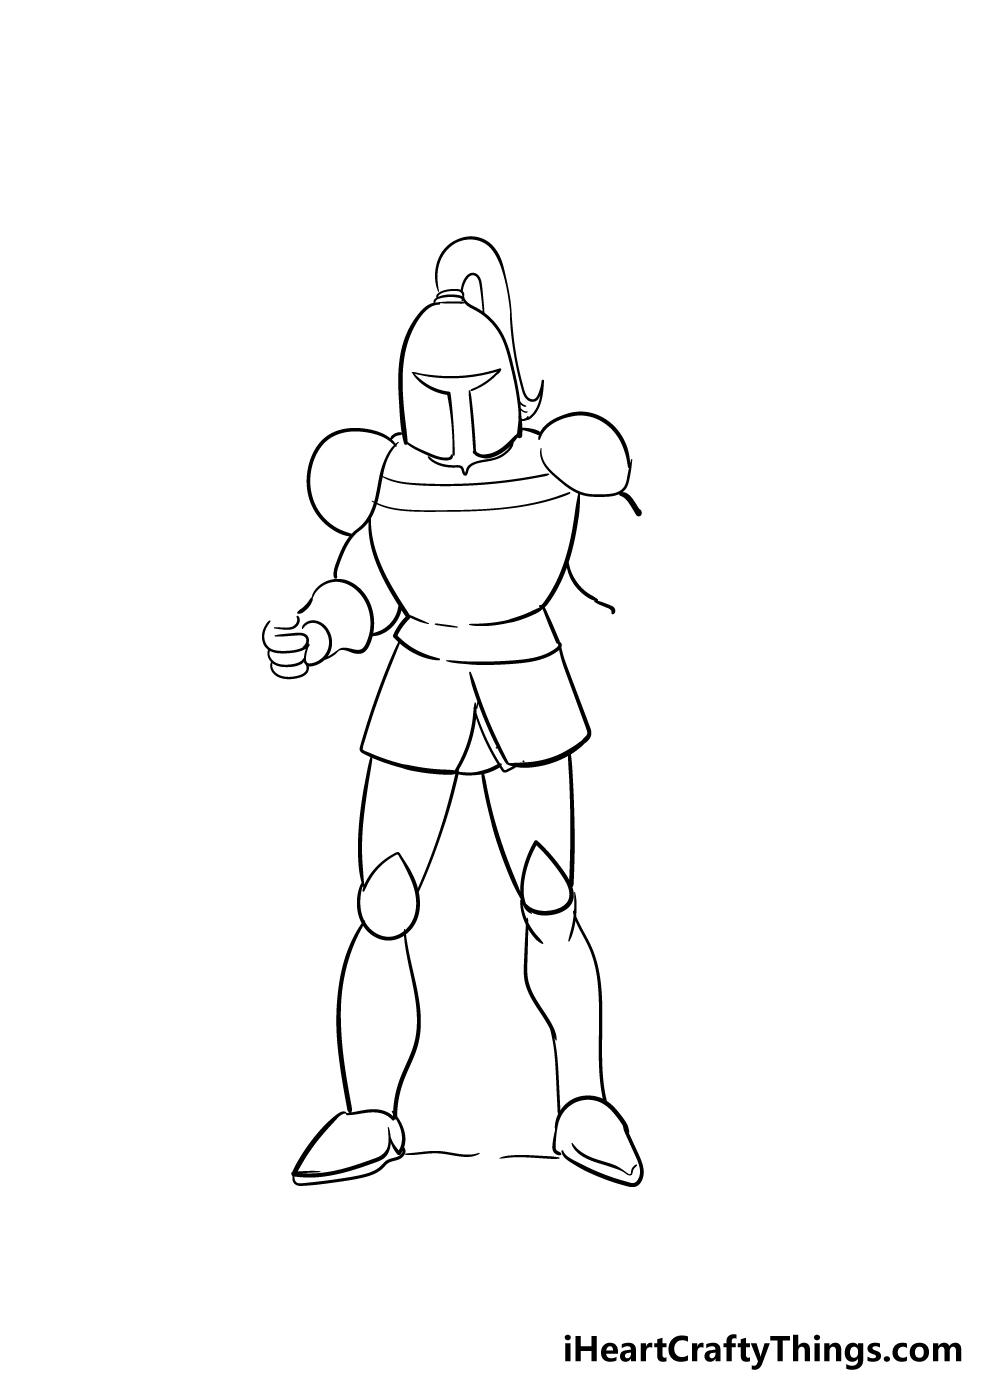 knight drawing step 5